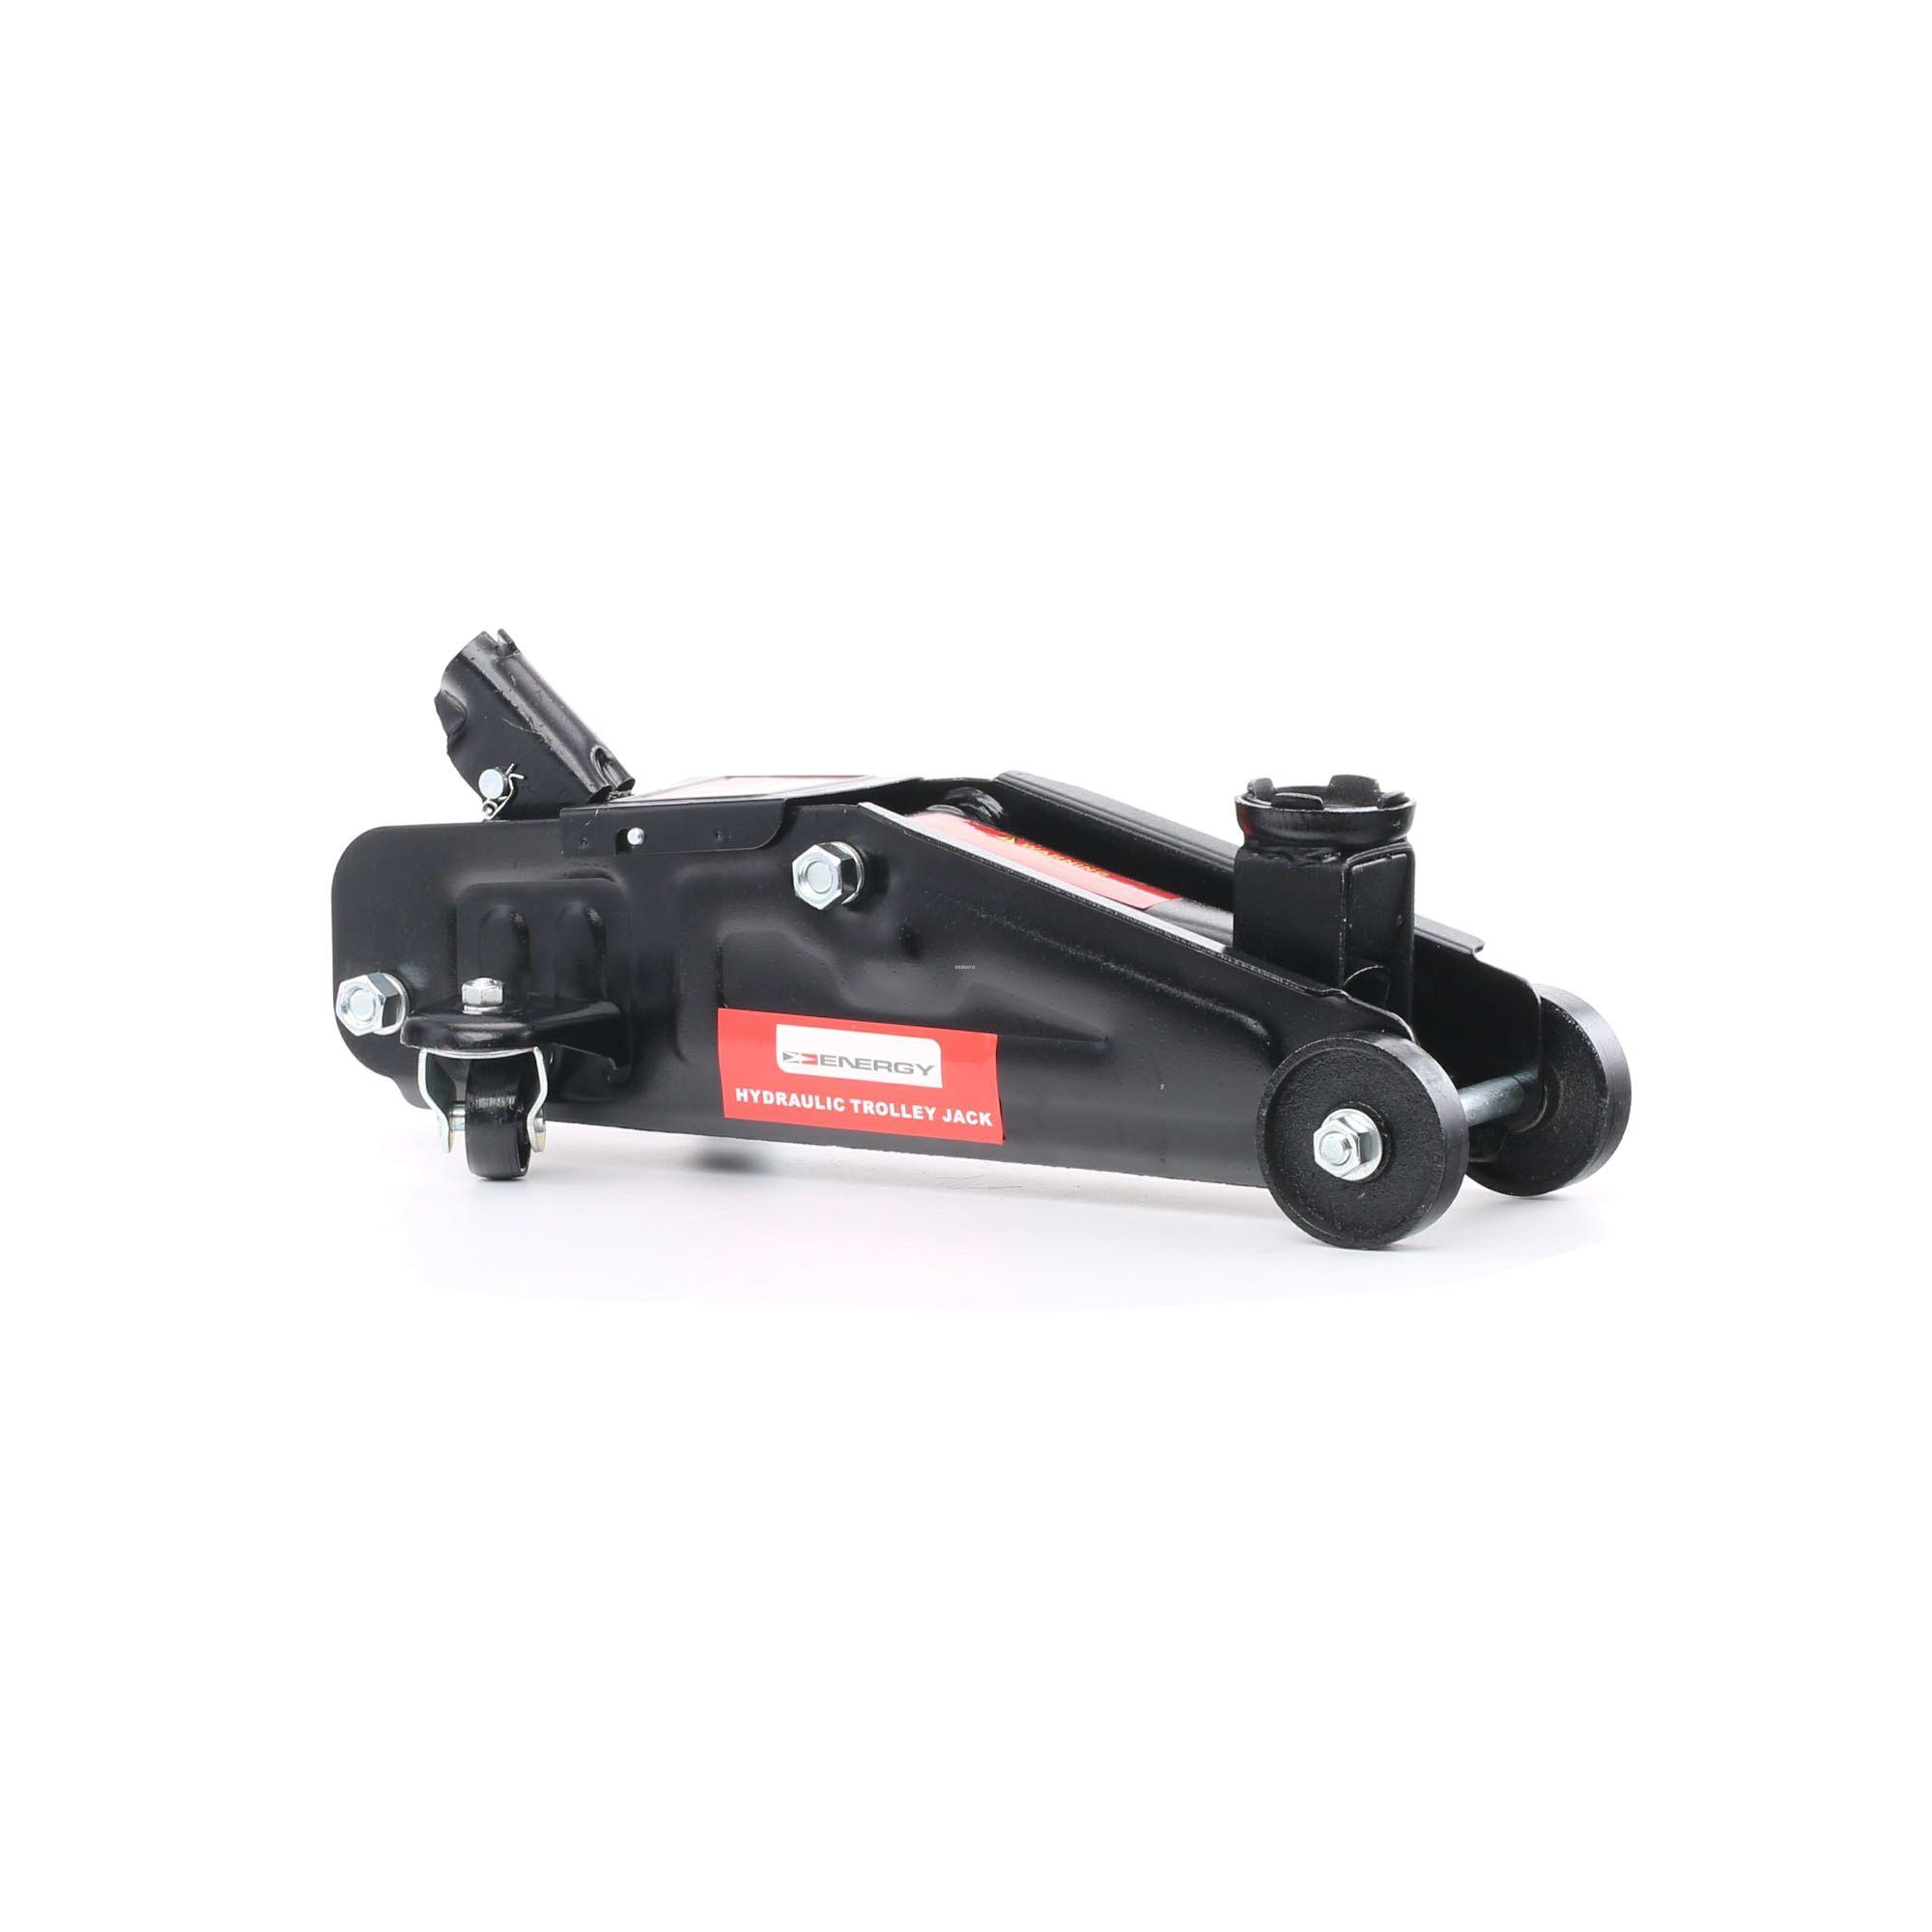 NE00272 ENERGY 2t, hydraulisk, Passagerarbilar, Garagedomkraft Domkraft NE00272 köp lågt pris